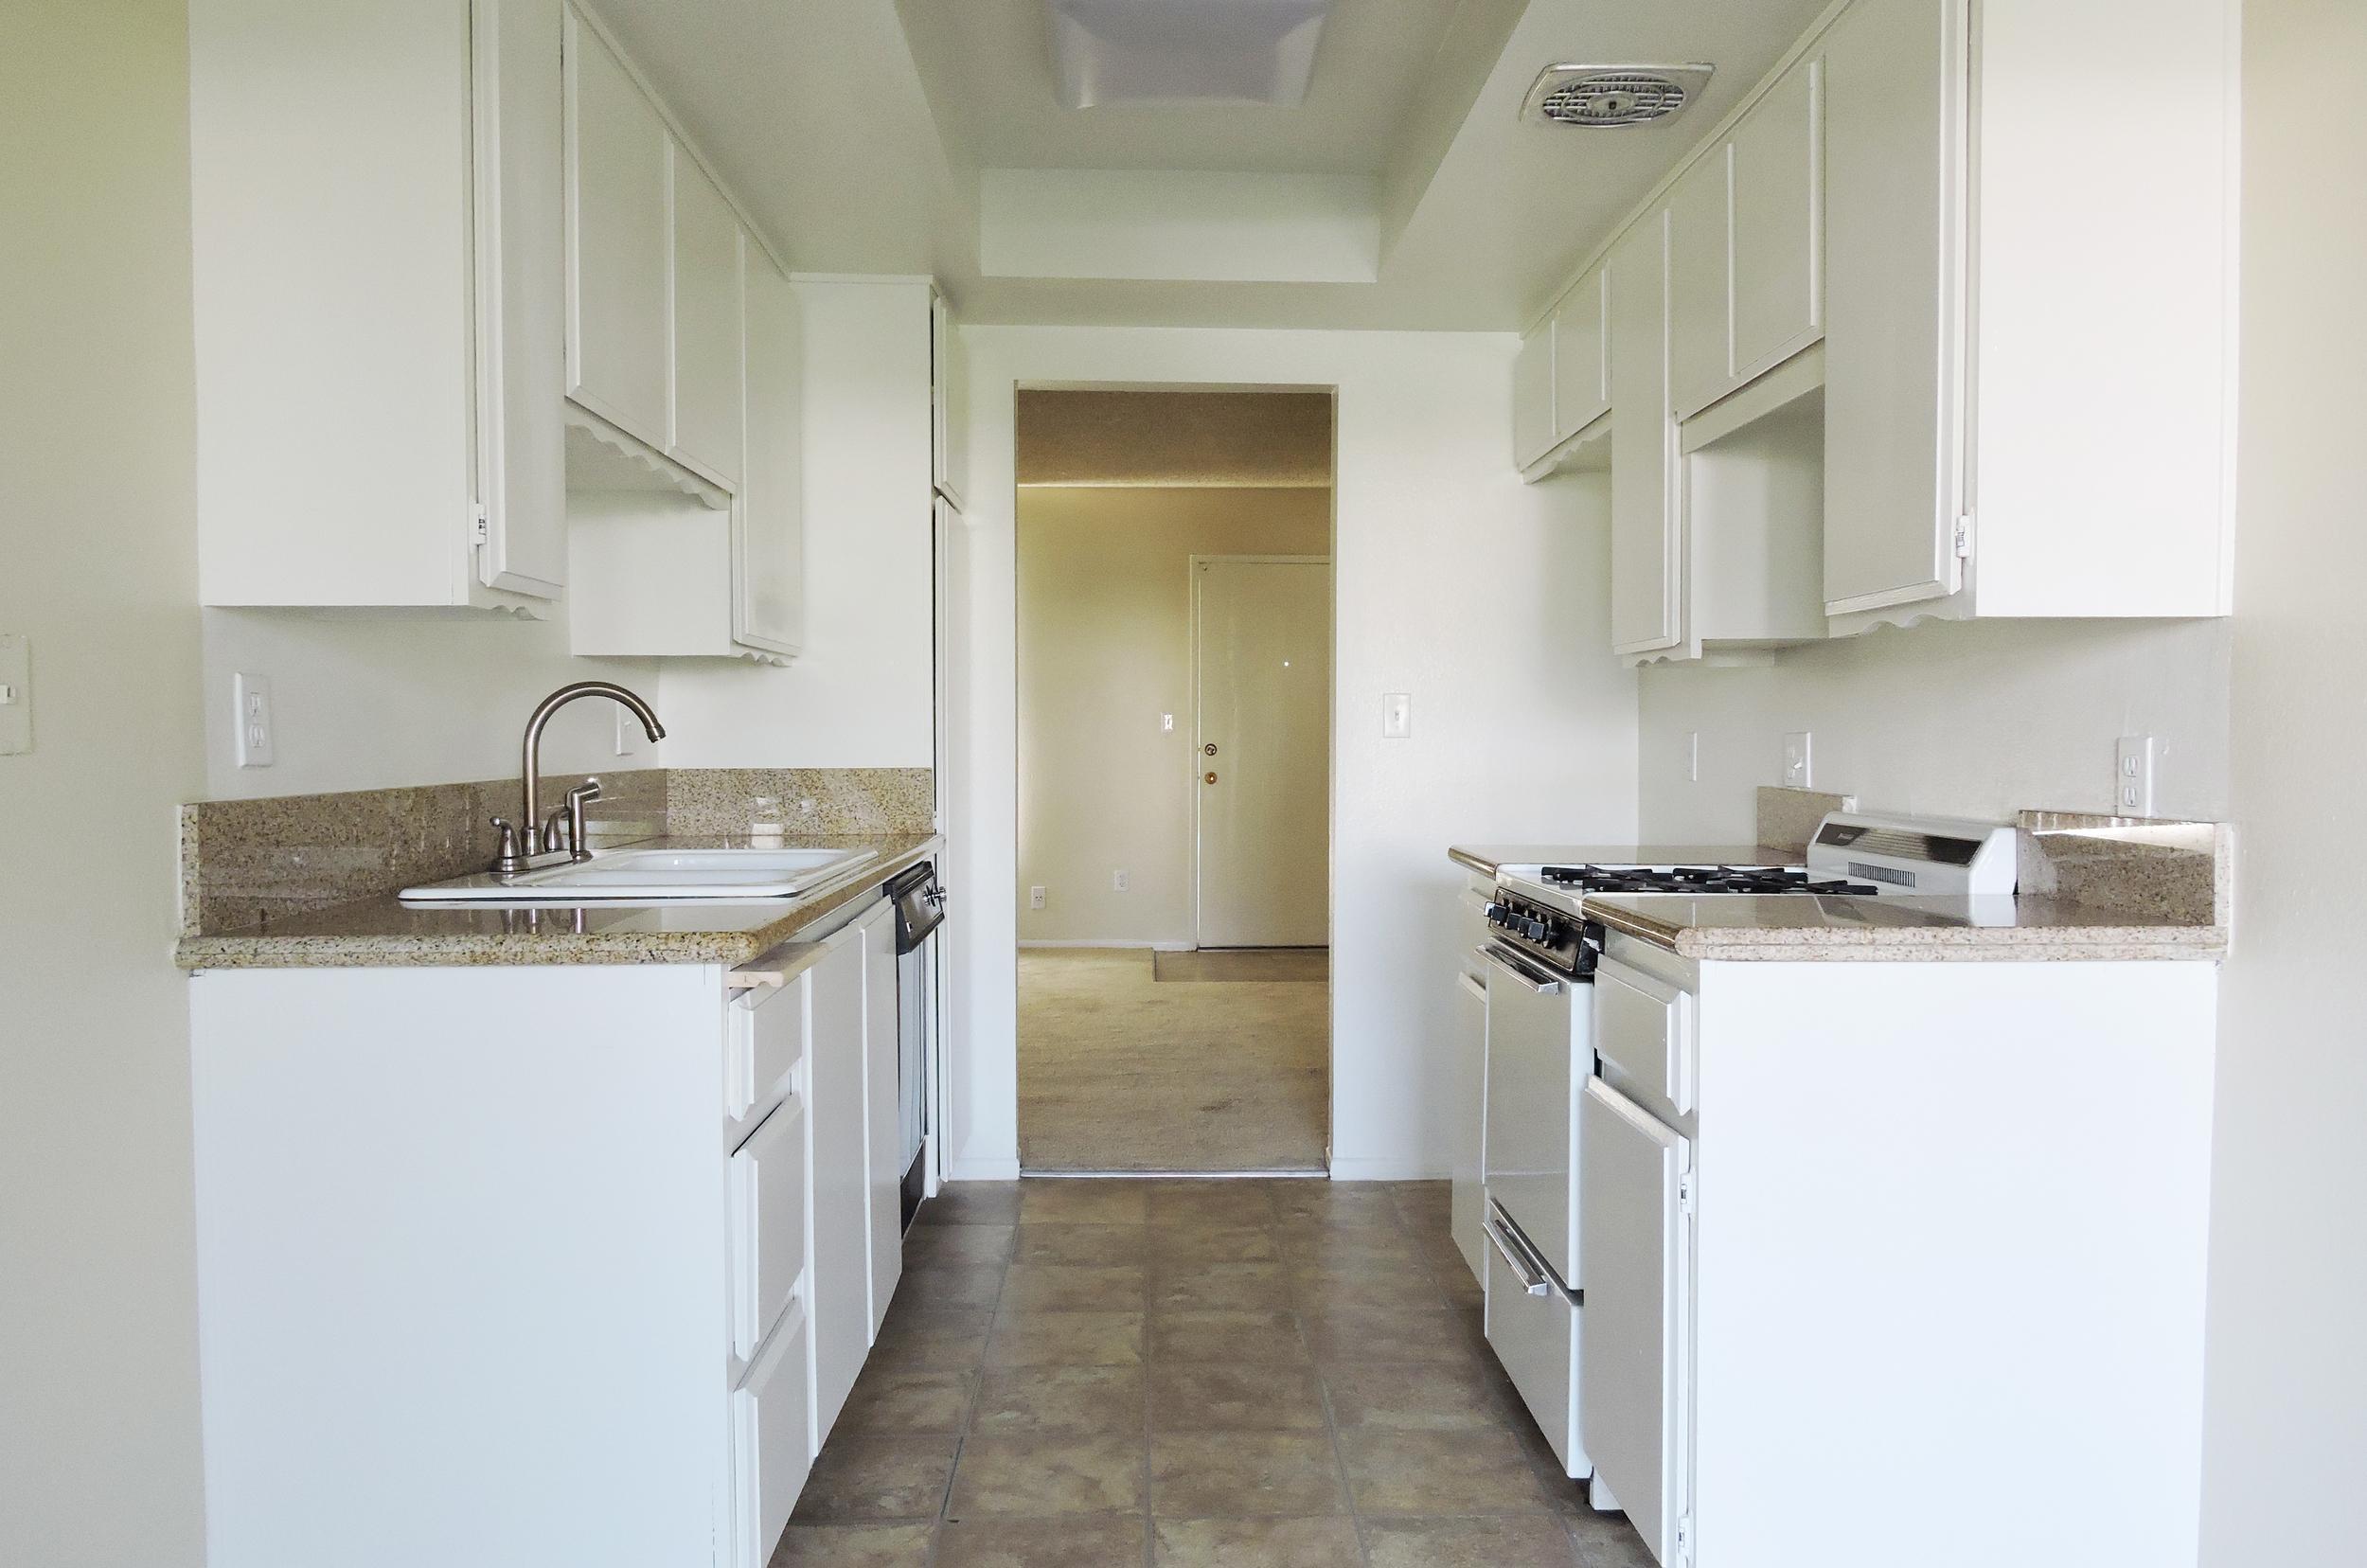 daisy kitchen 6.jpg